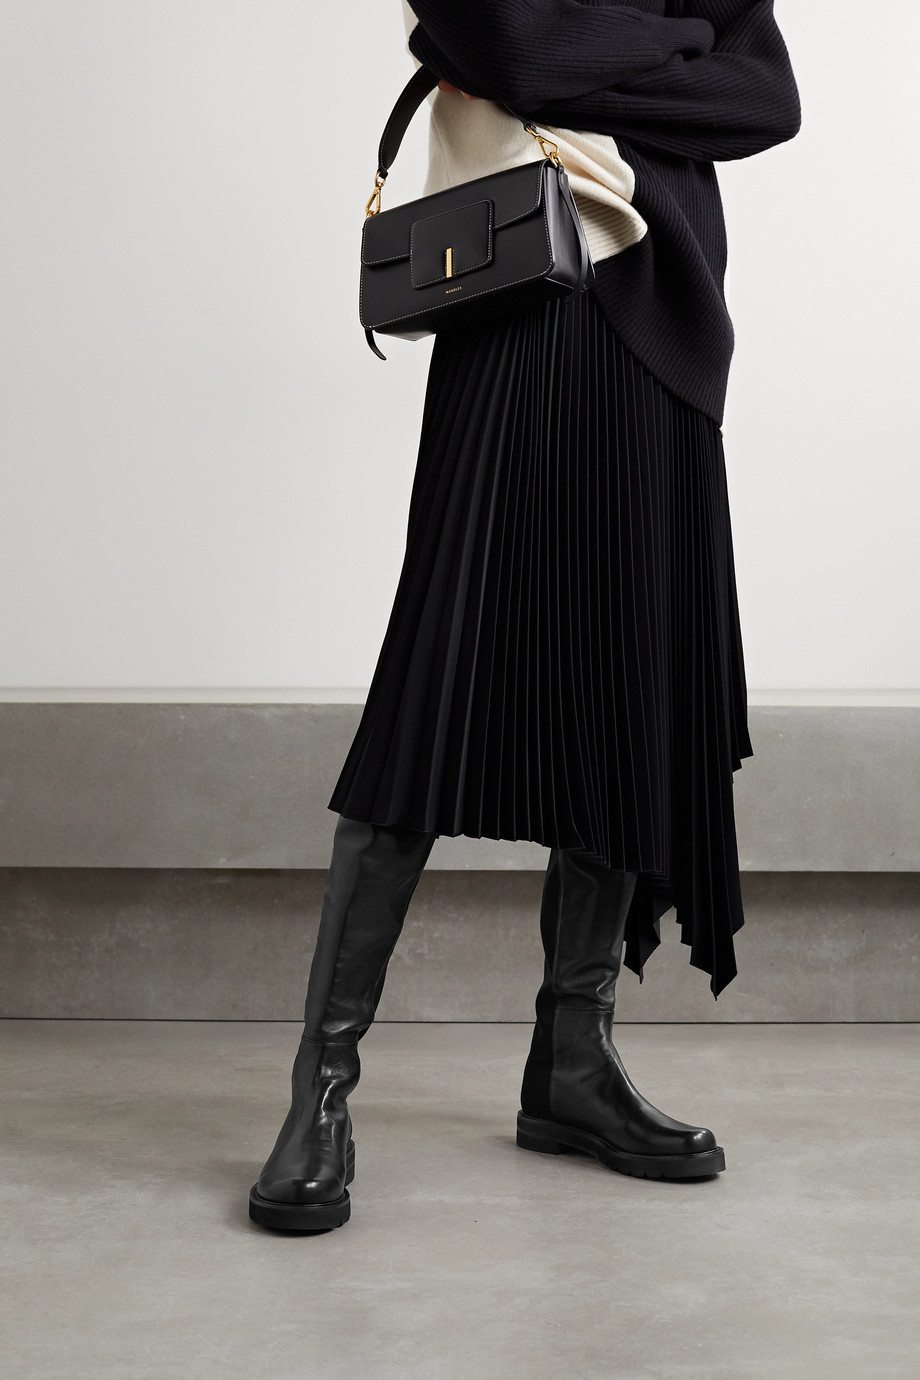 Stuart Weitzman 5050 Lift leather and neoprene over-the-knee boots